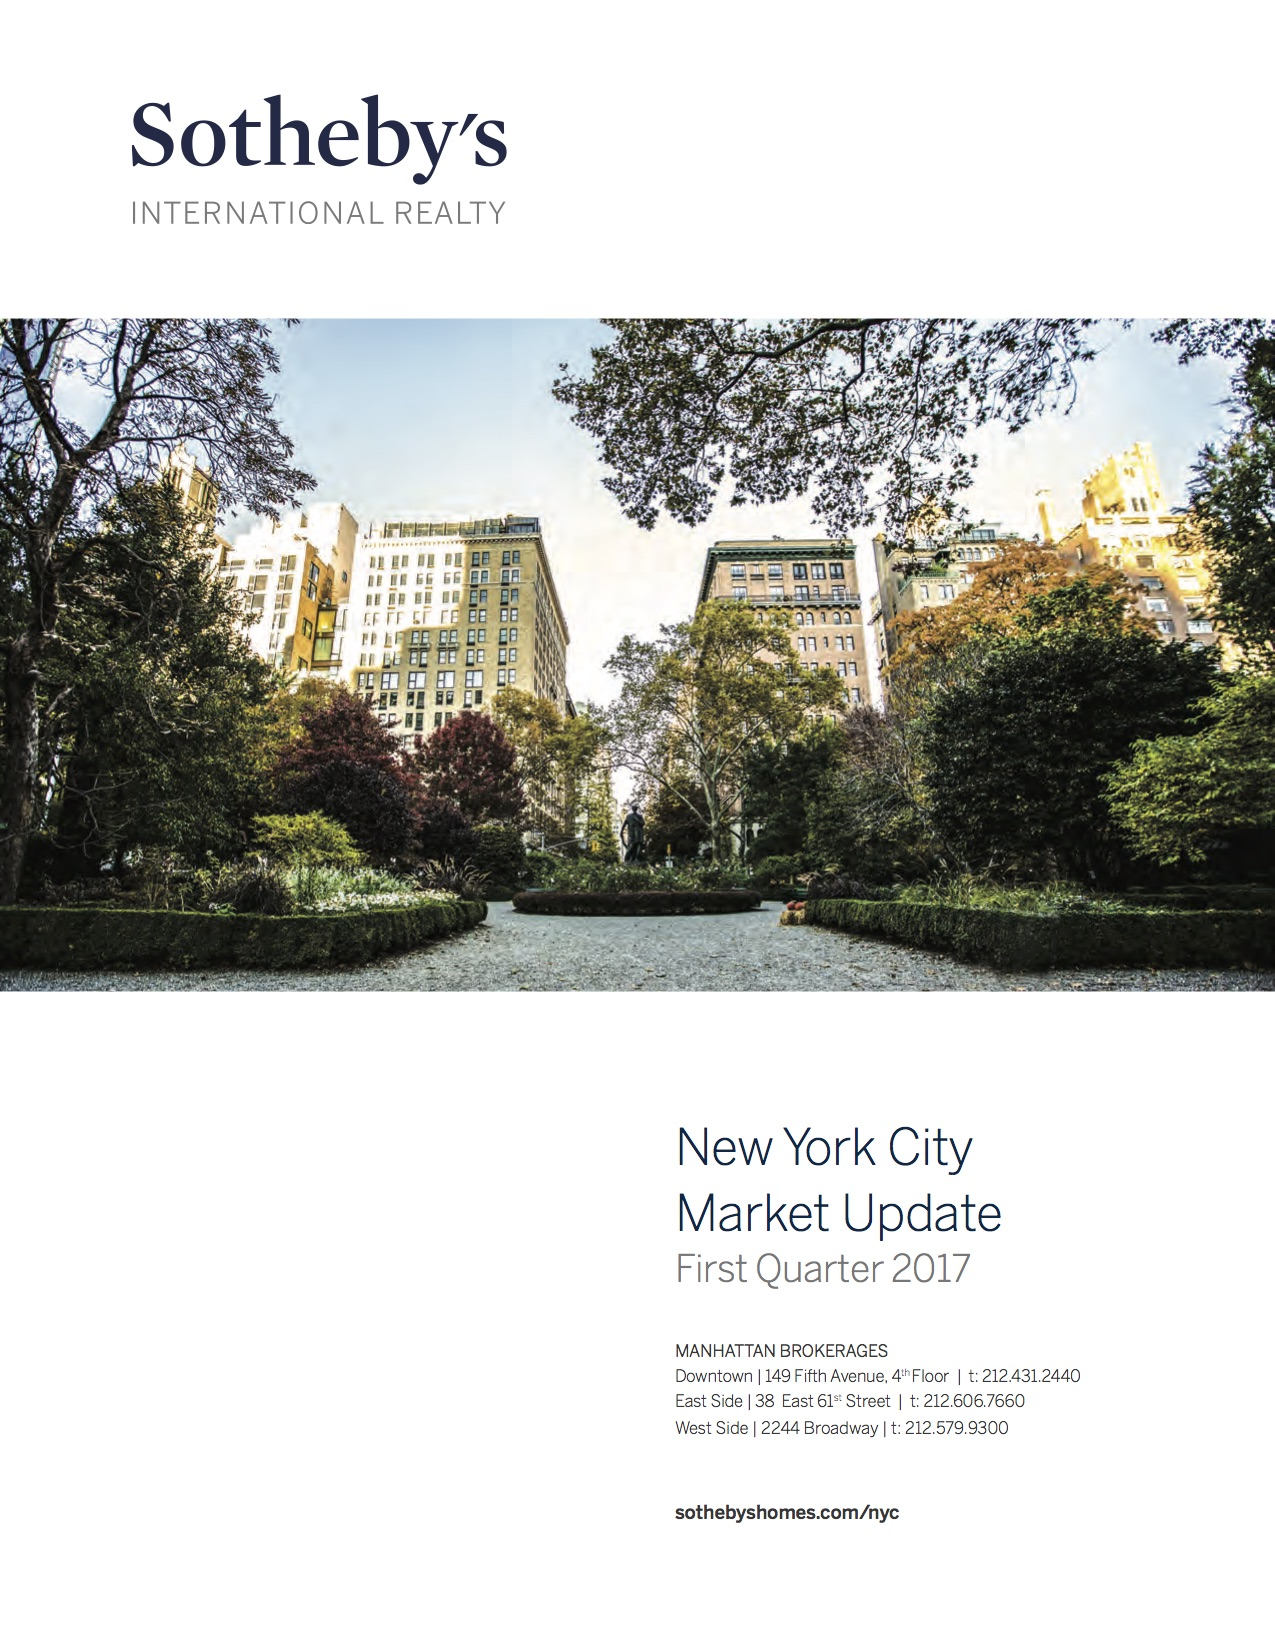 NYC_MarketUpdate_Q1_2017.jpg